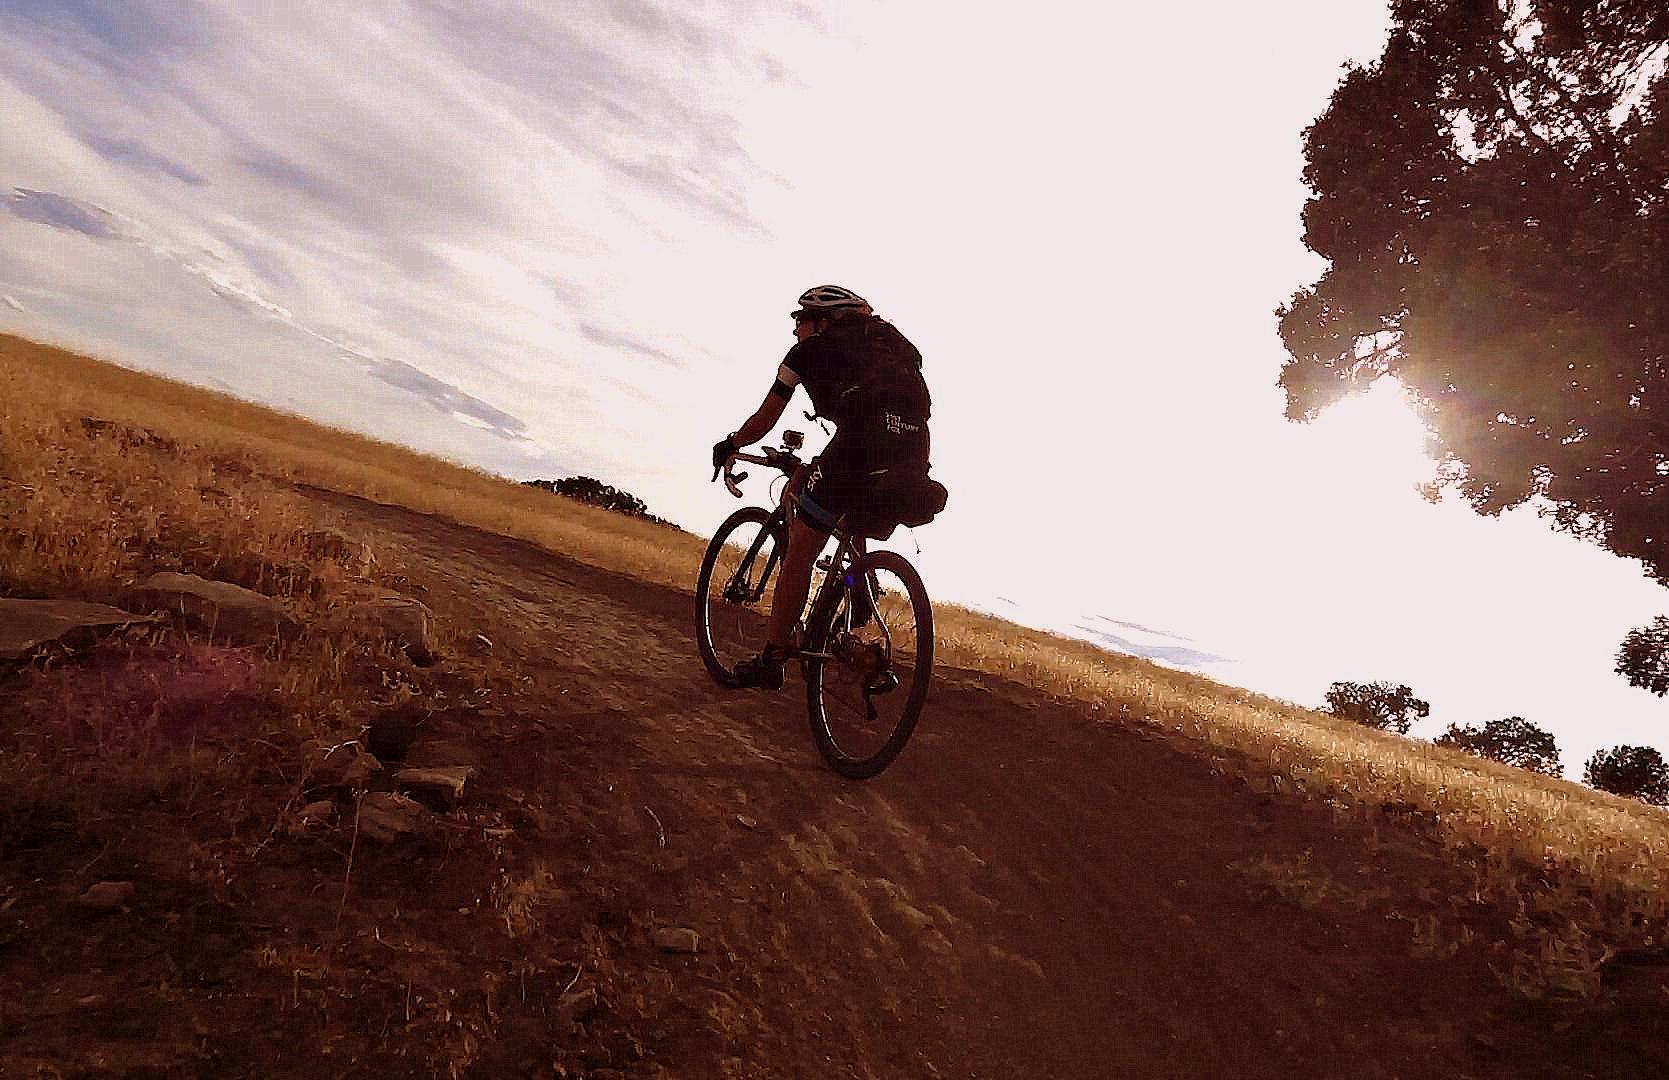 Away From the Sun - video image - Rob Vandermark.jpg